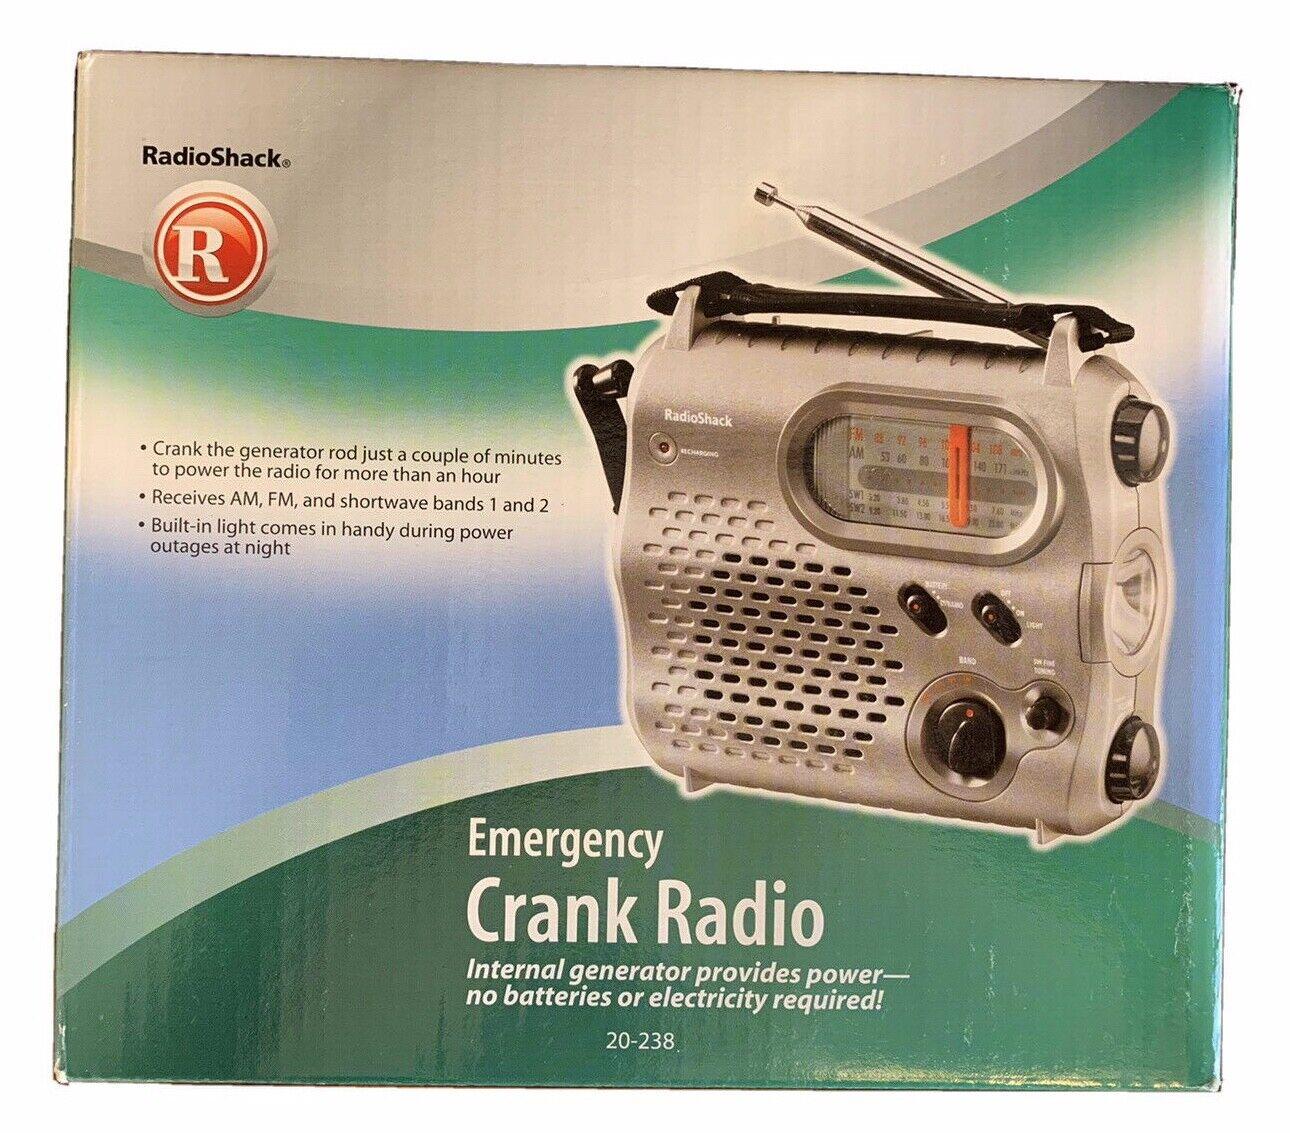 RadioShack Emergency Crank Radio AM/FM Shortwave Internal Ge